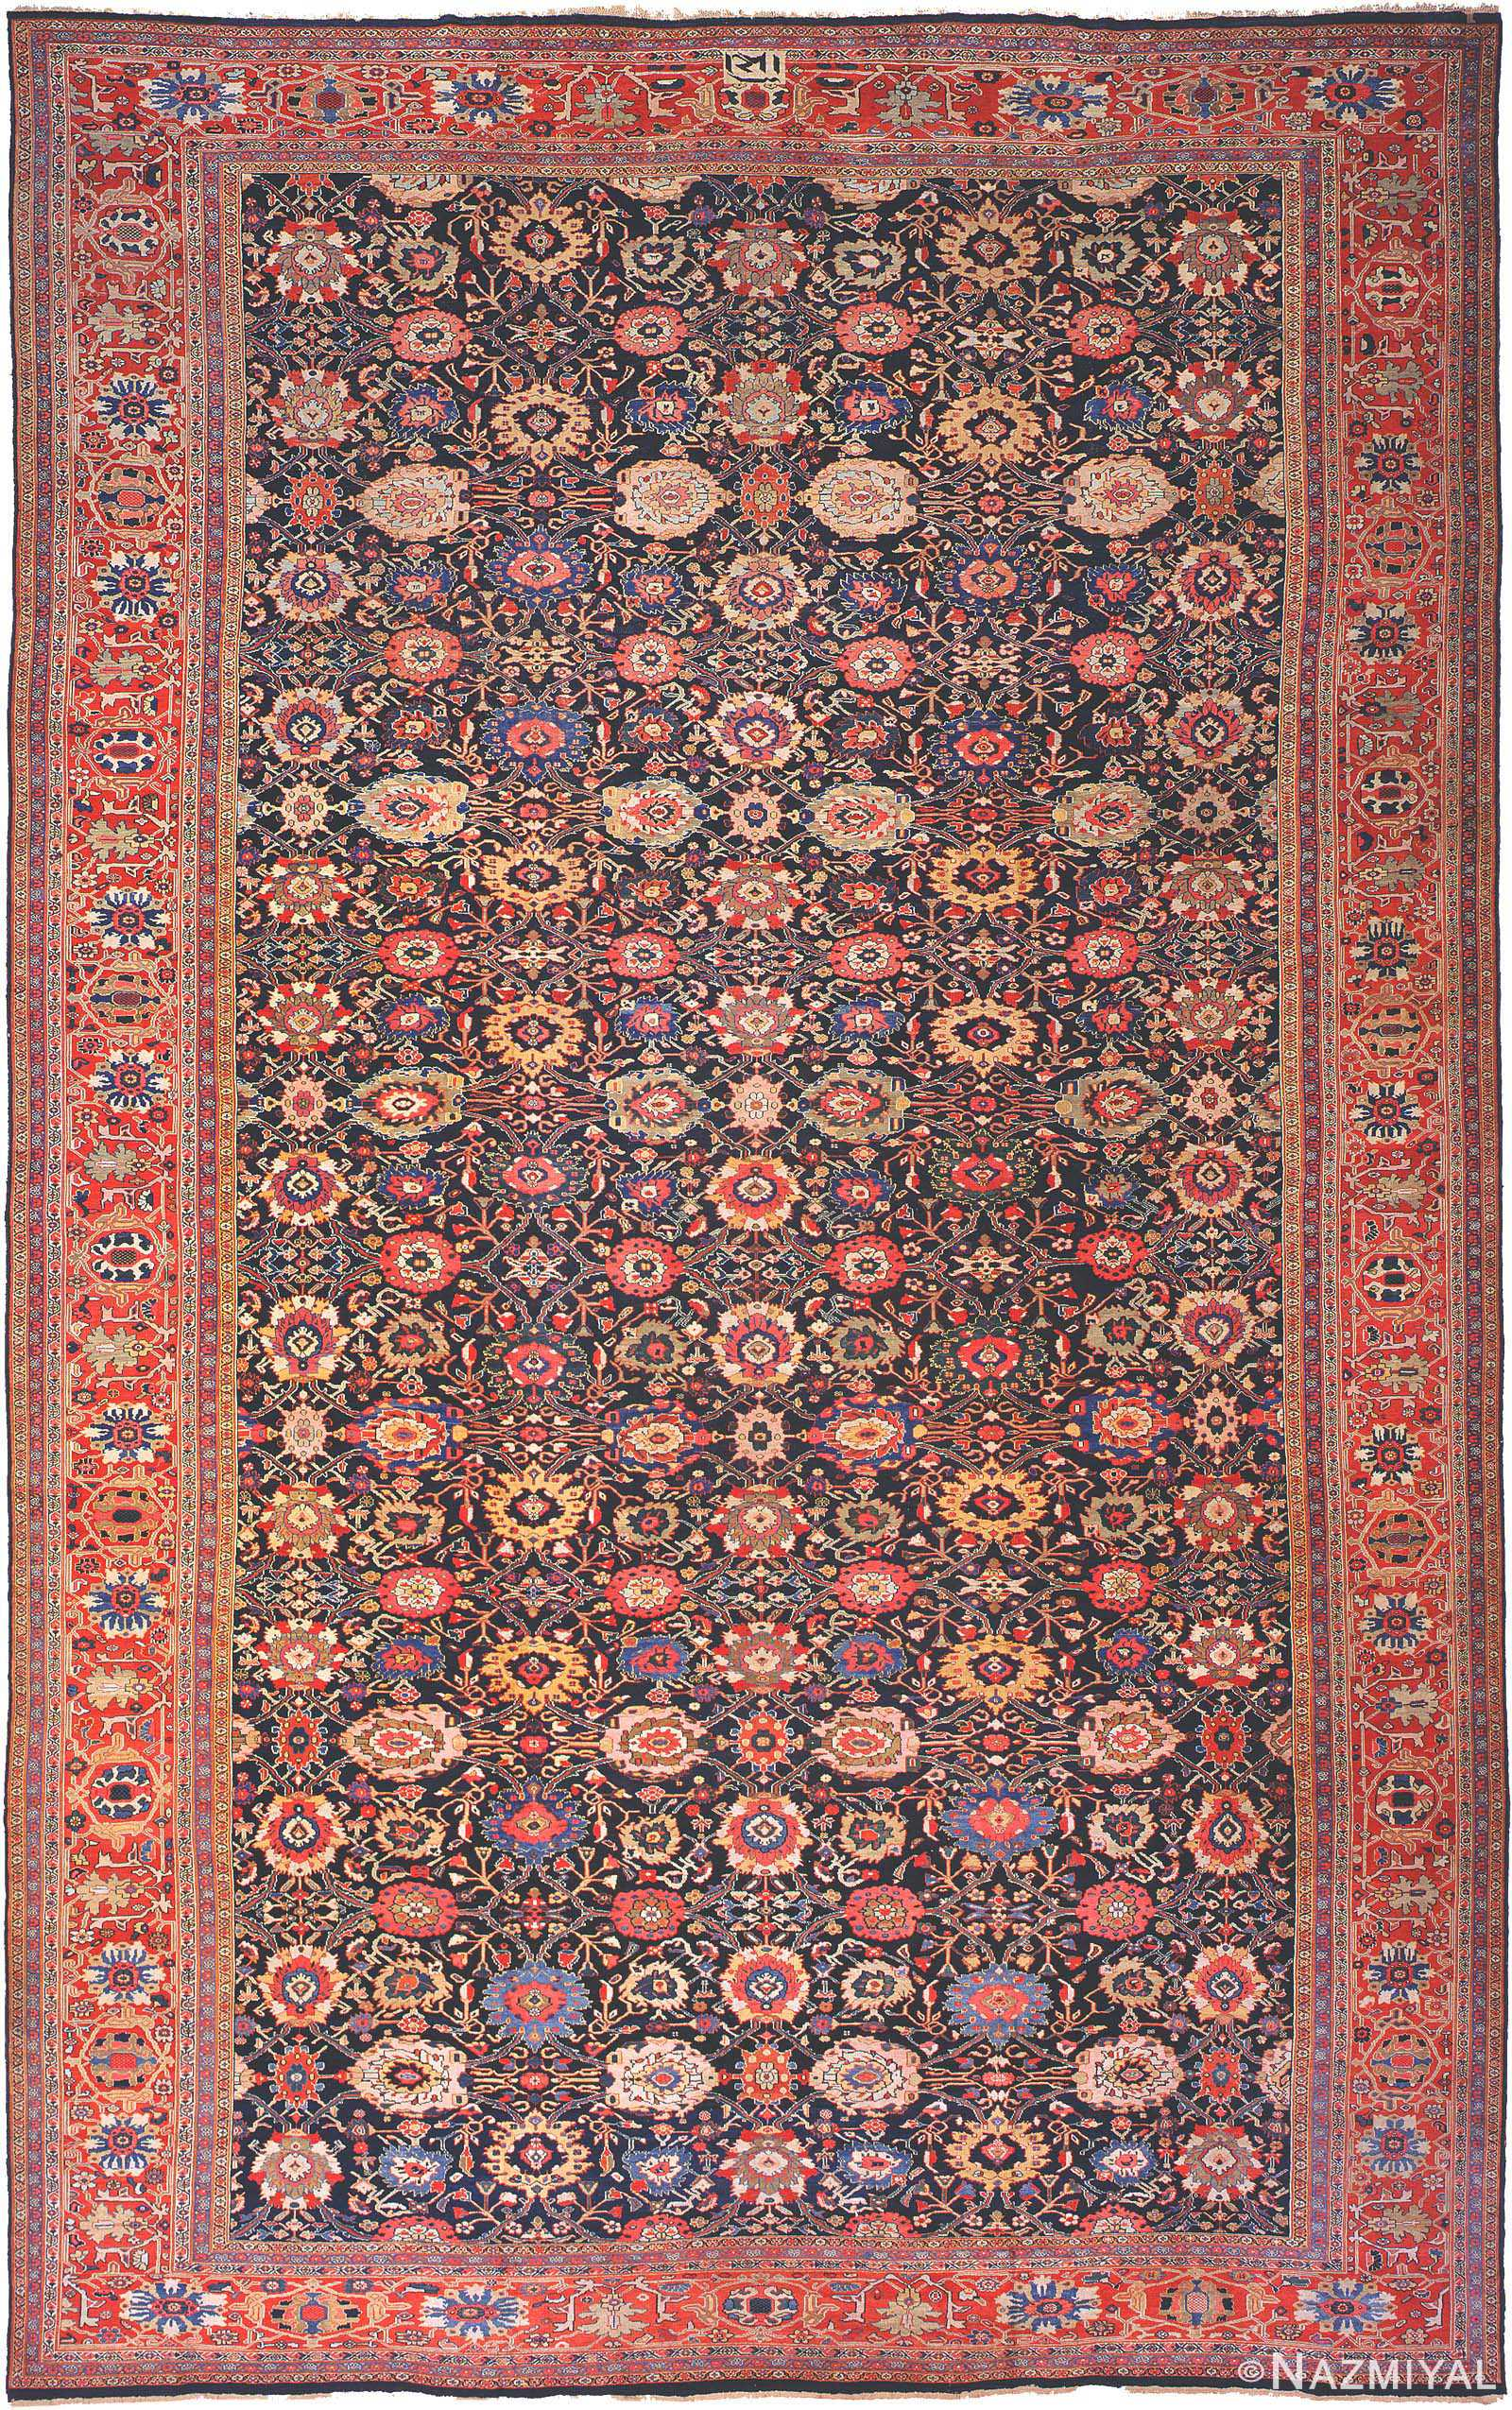 Antique Sultanabad Persian Carpet 3019 Nazmiyal